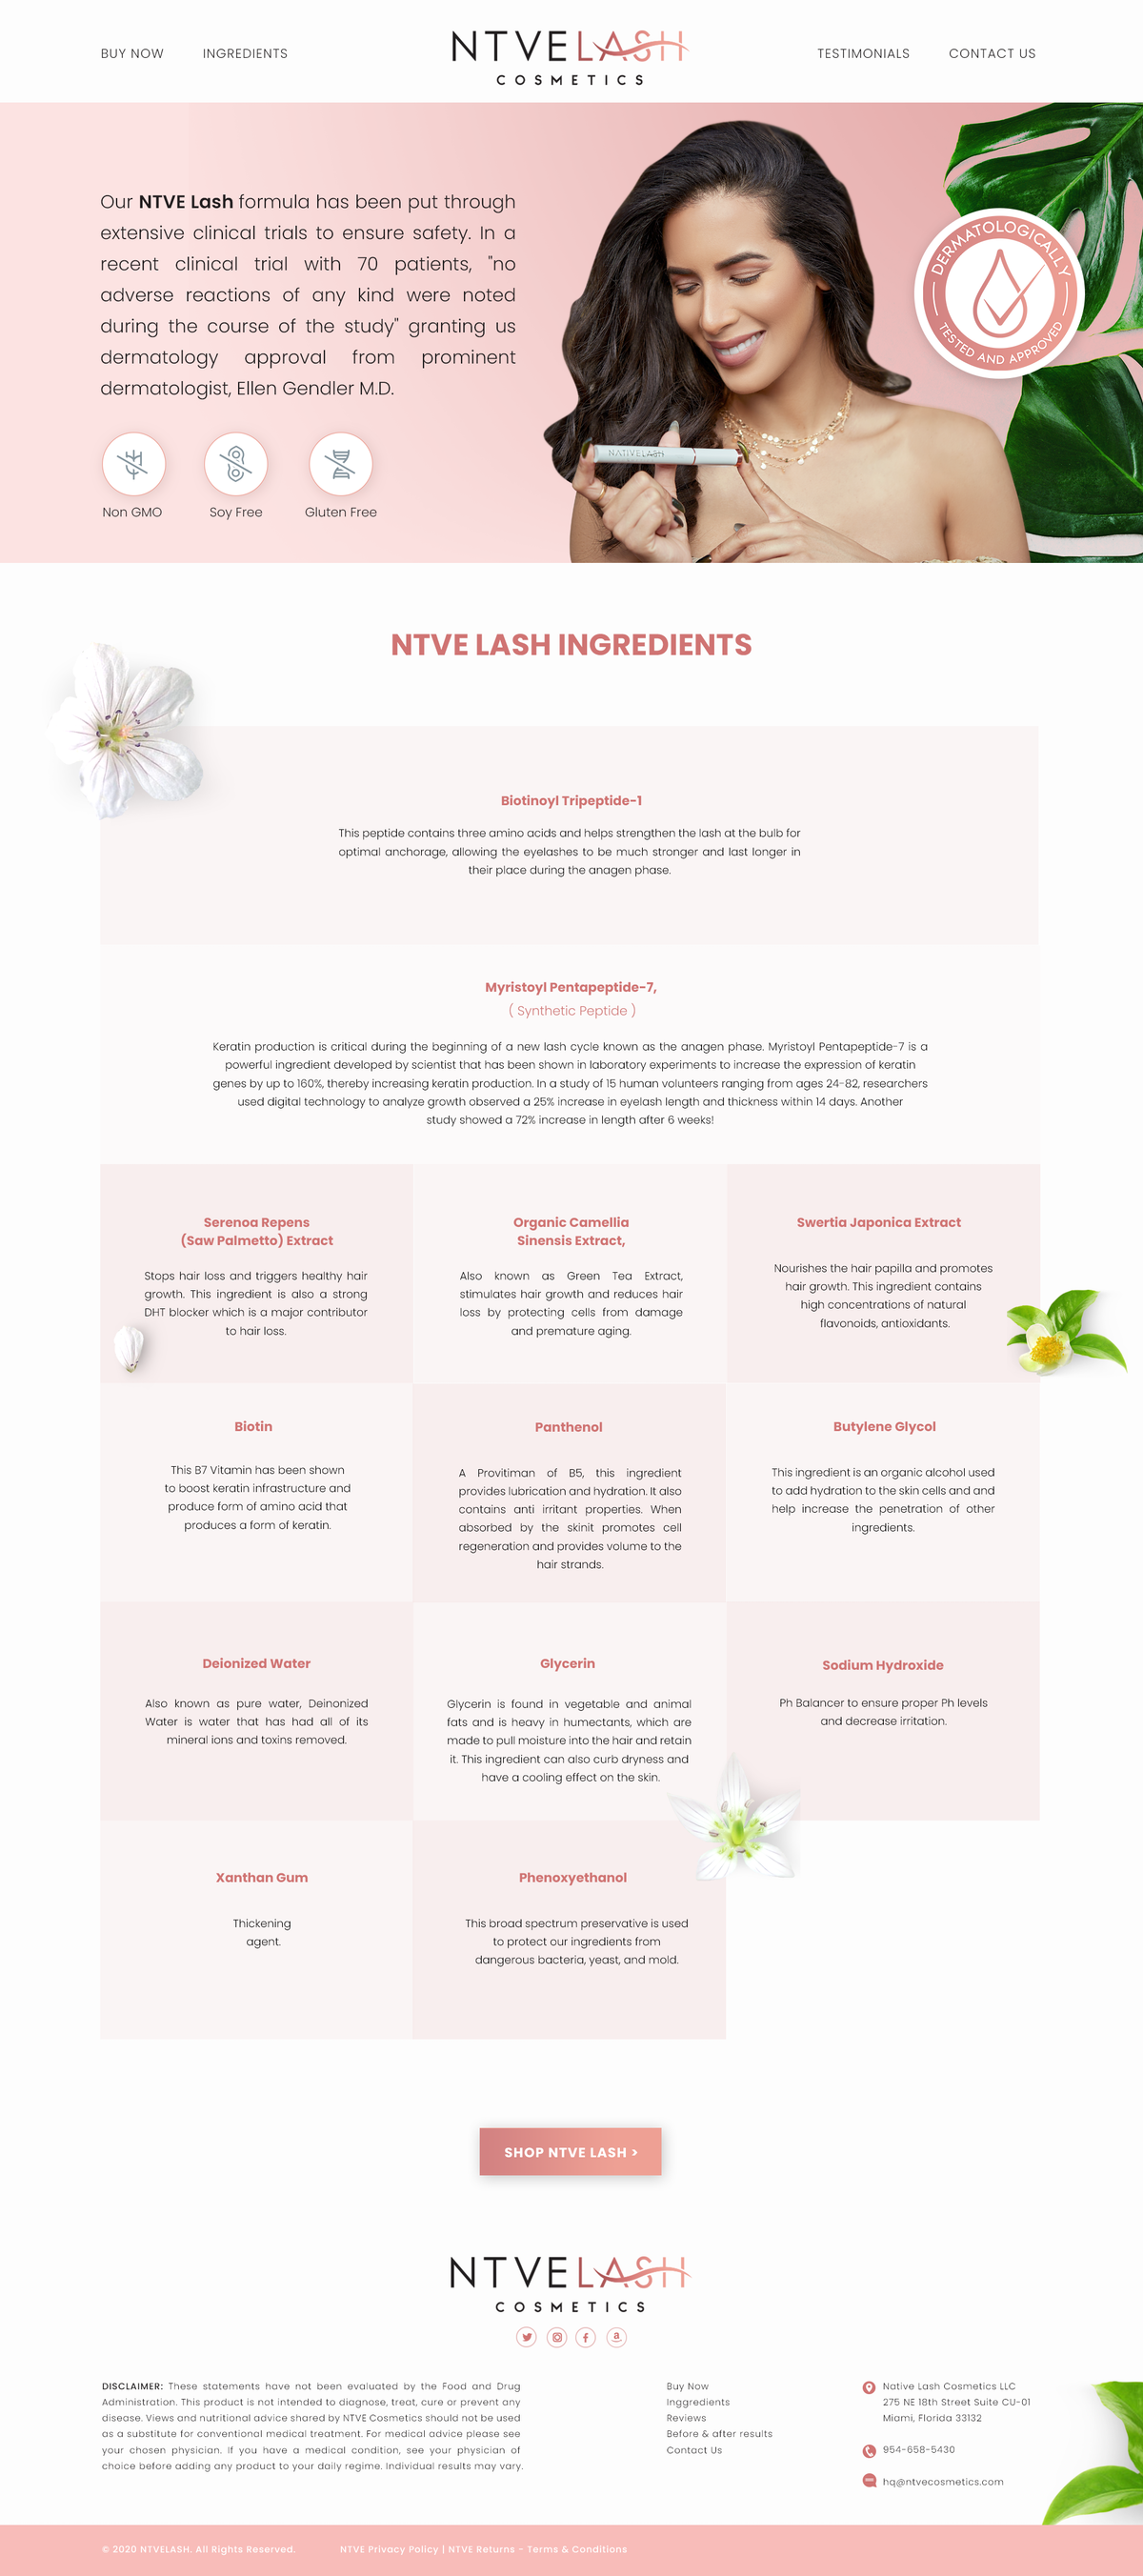 SHOPIFY DESIGN & GRAPHICS